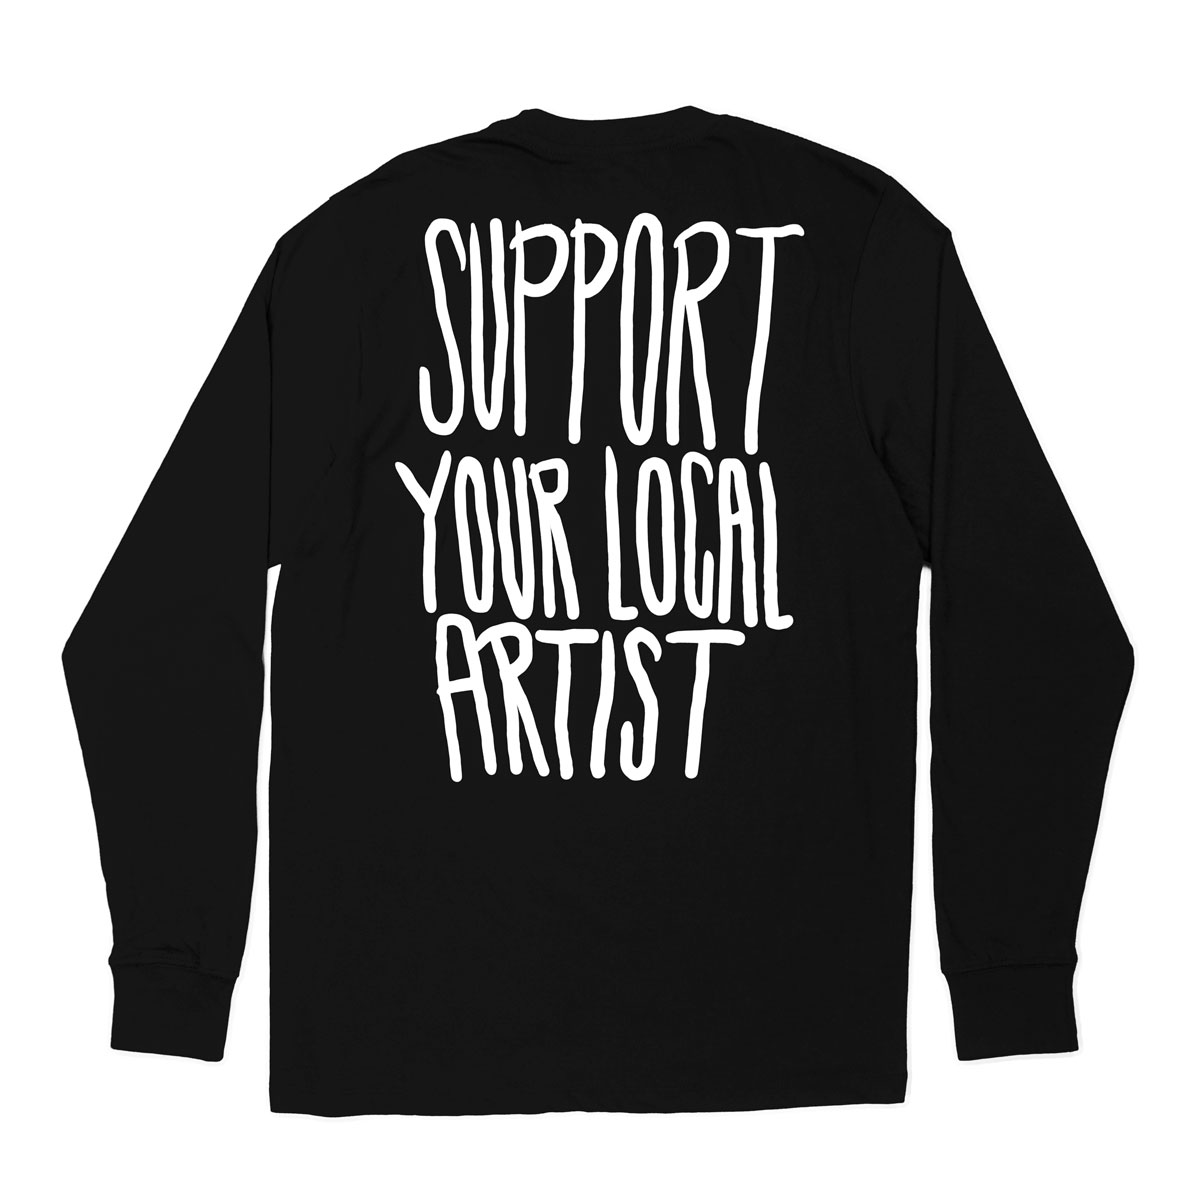 local artist long sleeve